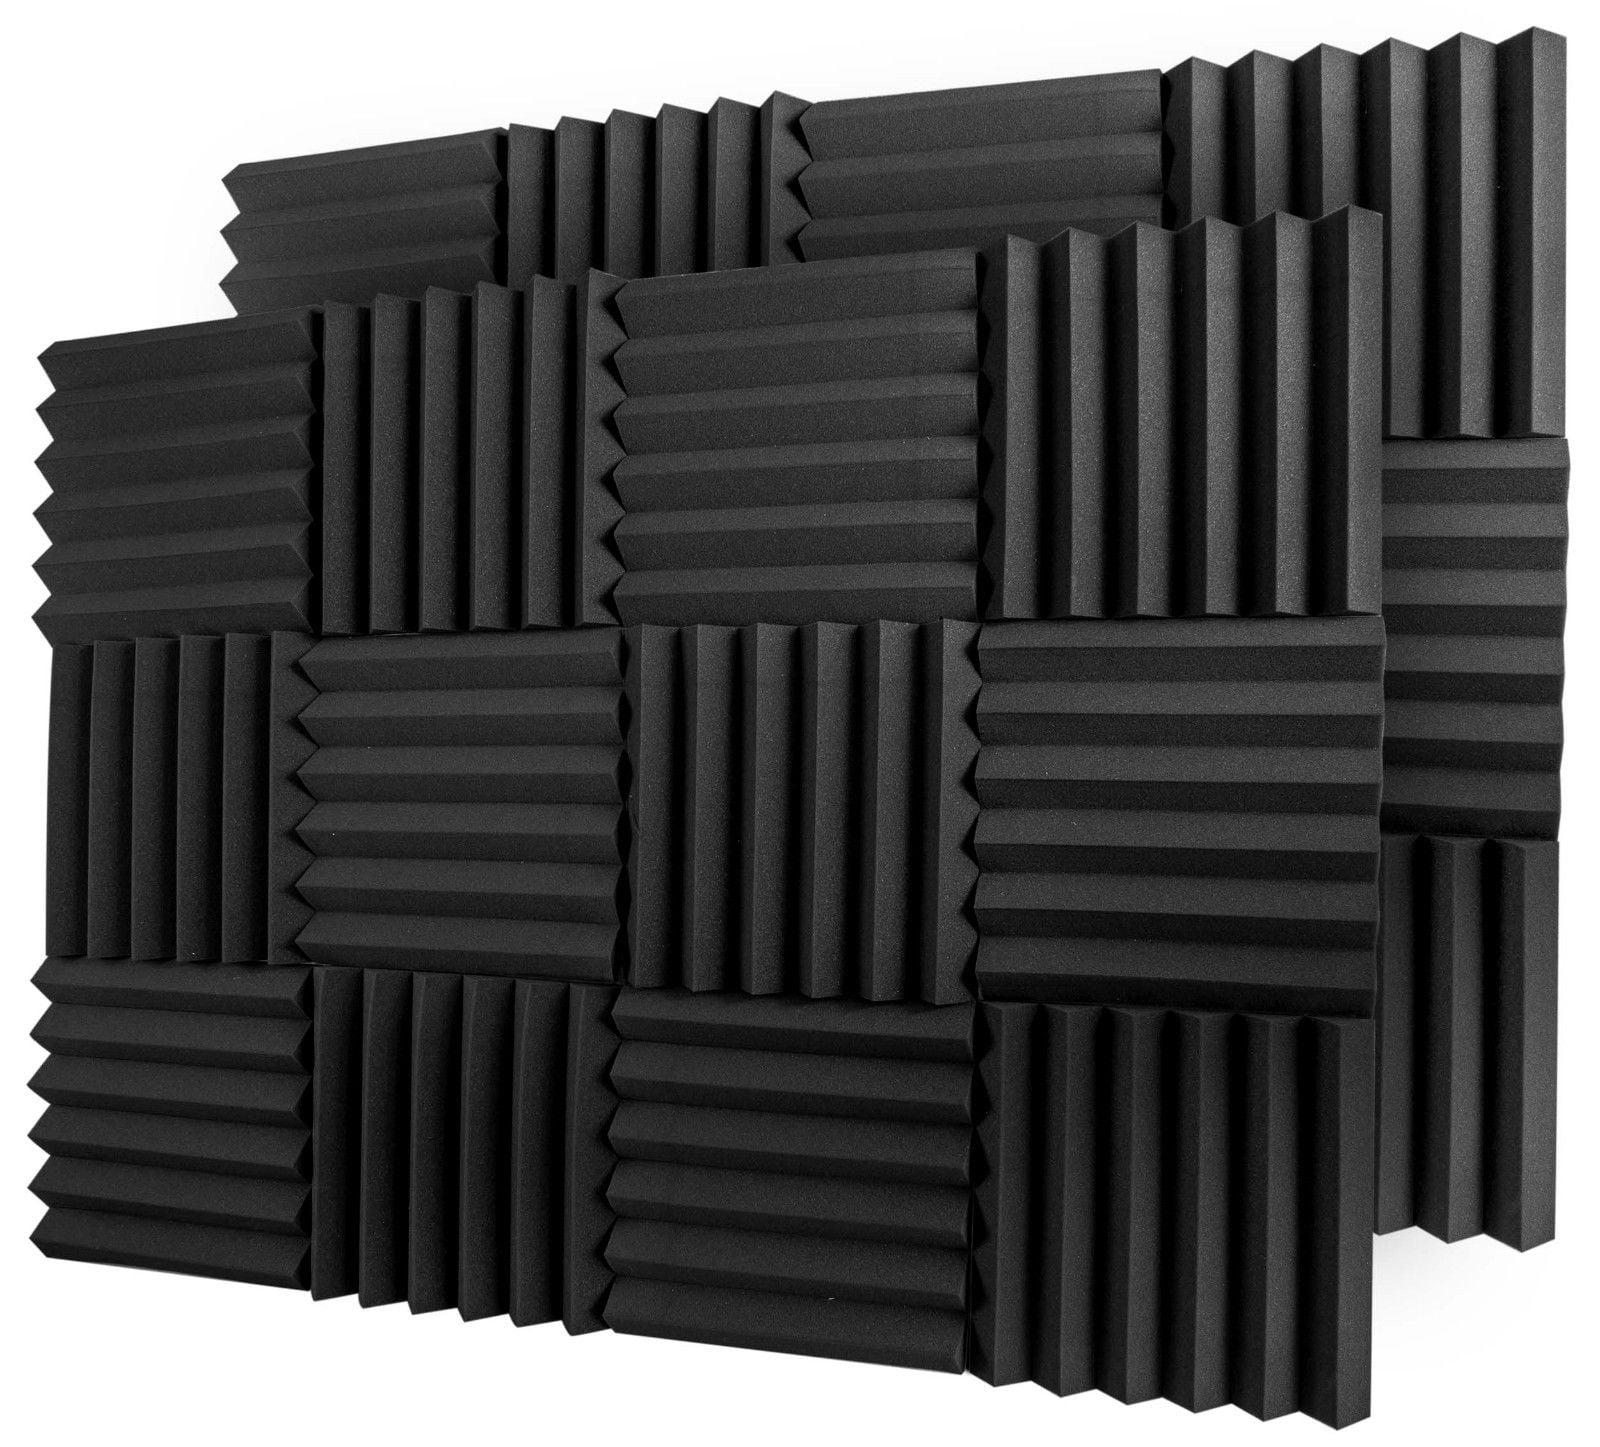 "12 Acoustic Foam Tiles Wall Record Studio Sound Proof 12""x 12""x 2"" Fire Resistant Panels"